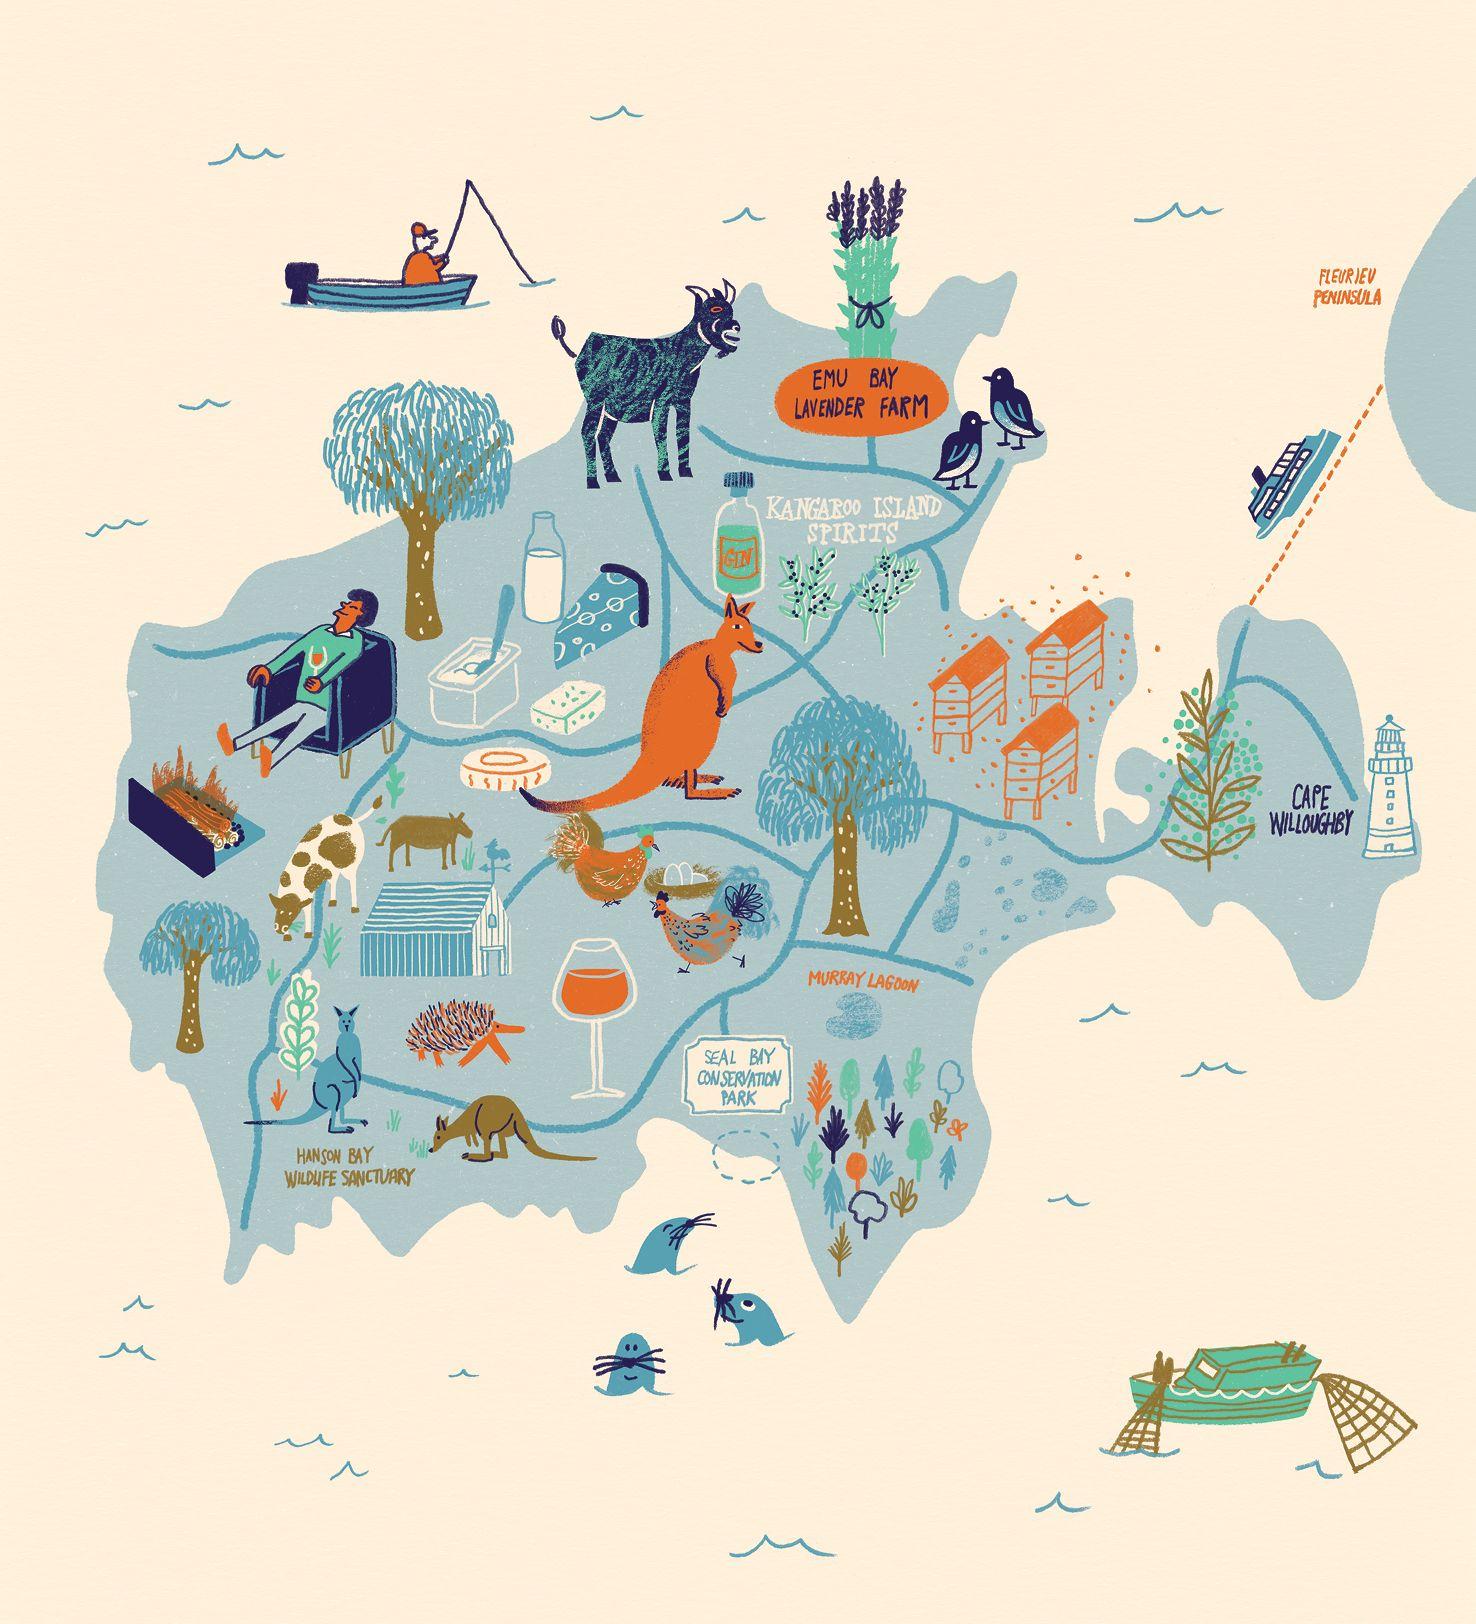 Kangaroo Island Australia Map.Kangaroo Island Illustration By Daniel Gray Flavours Of South